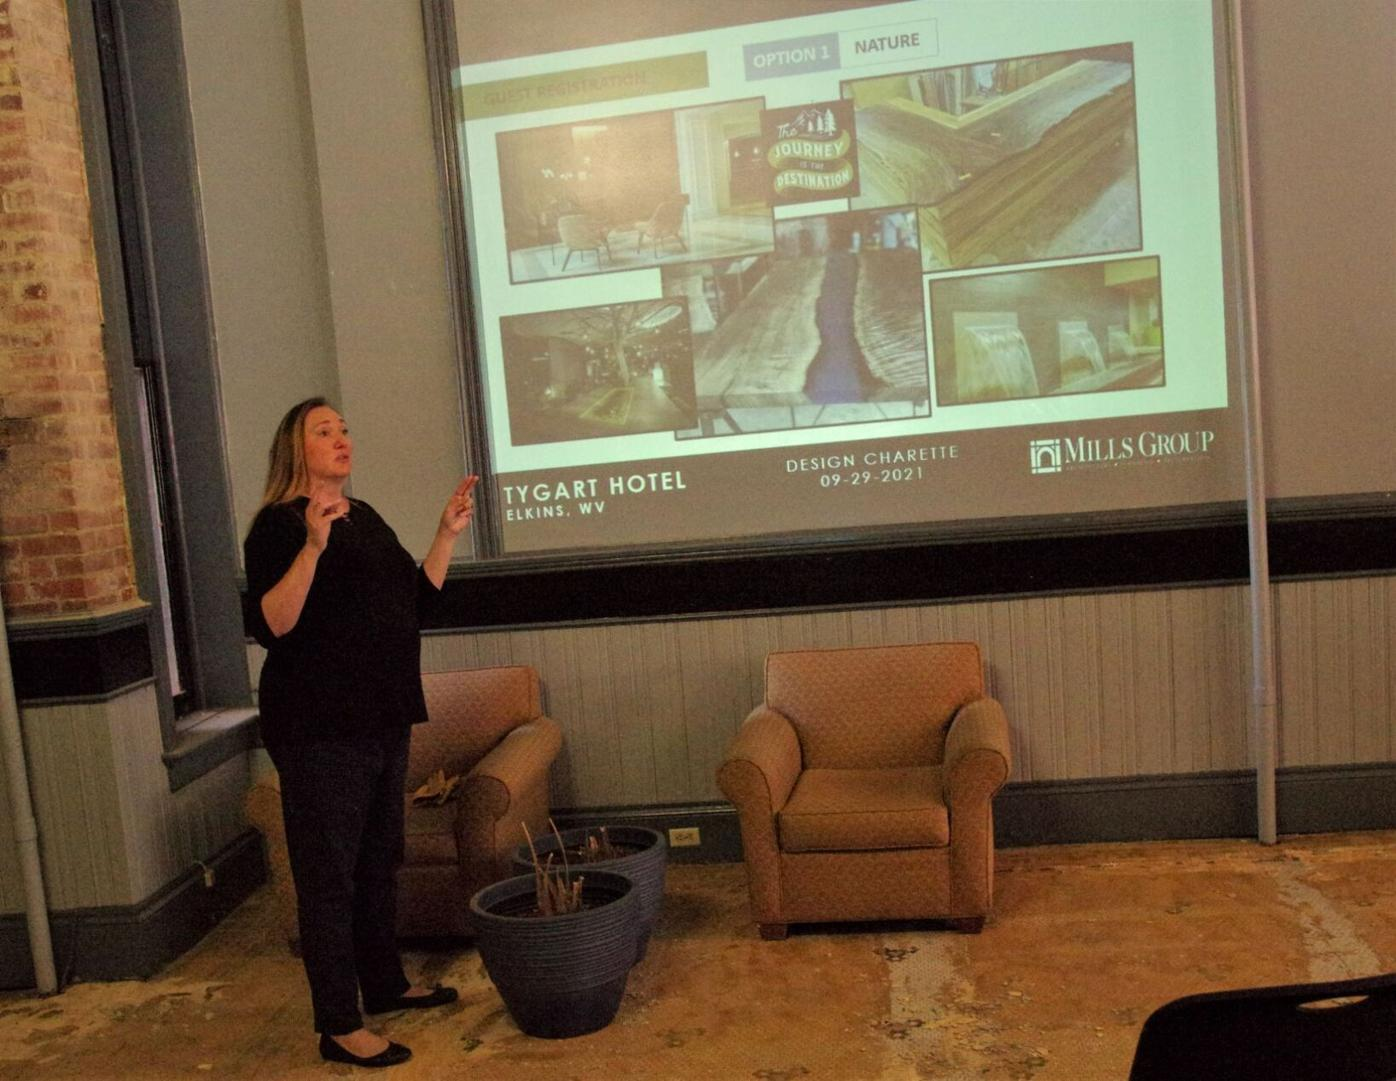 Tygart Hotel design presentation